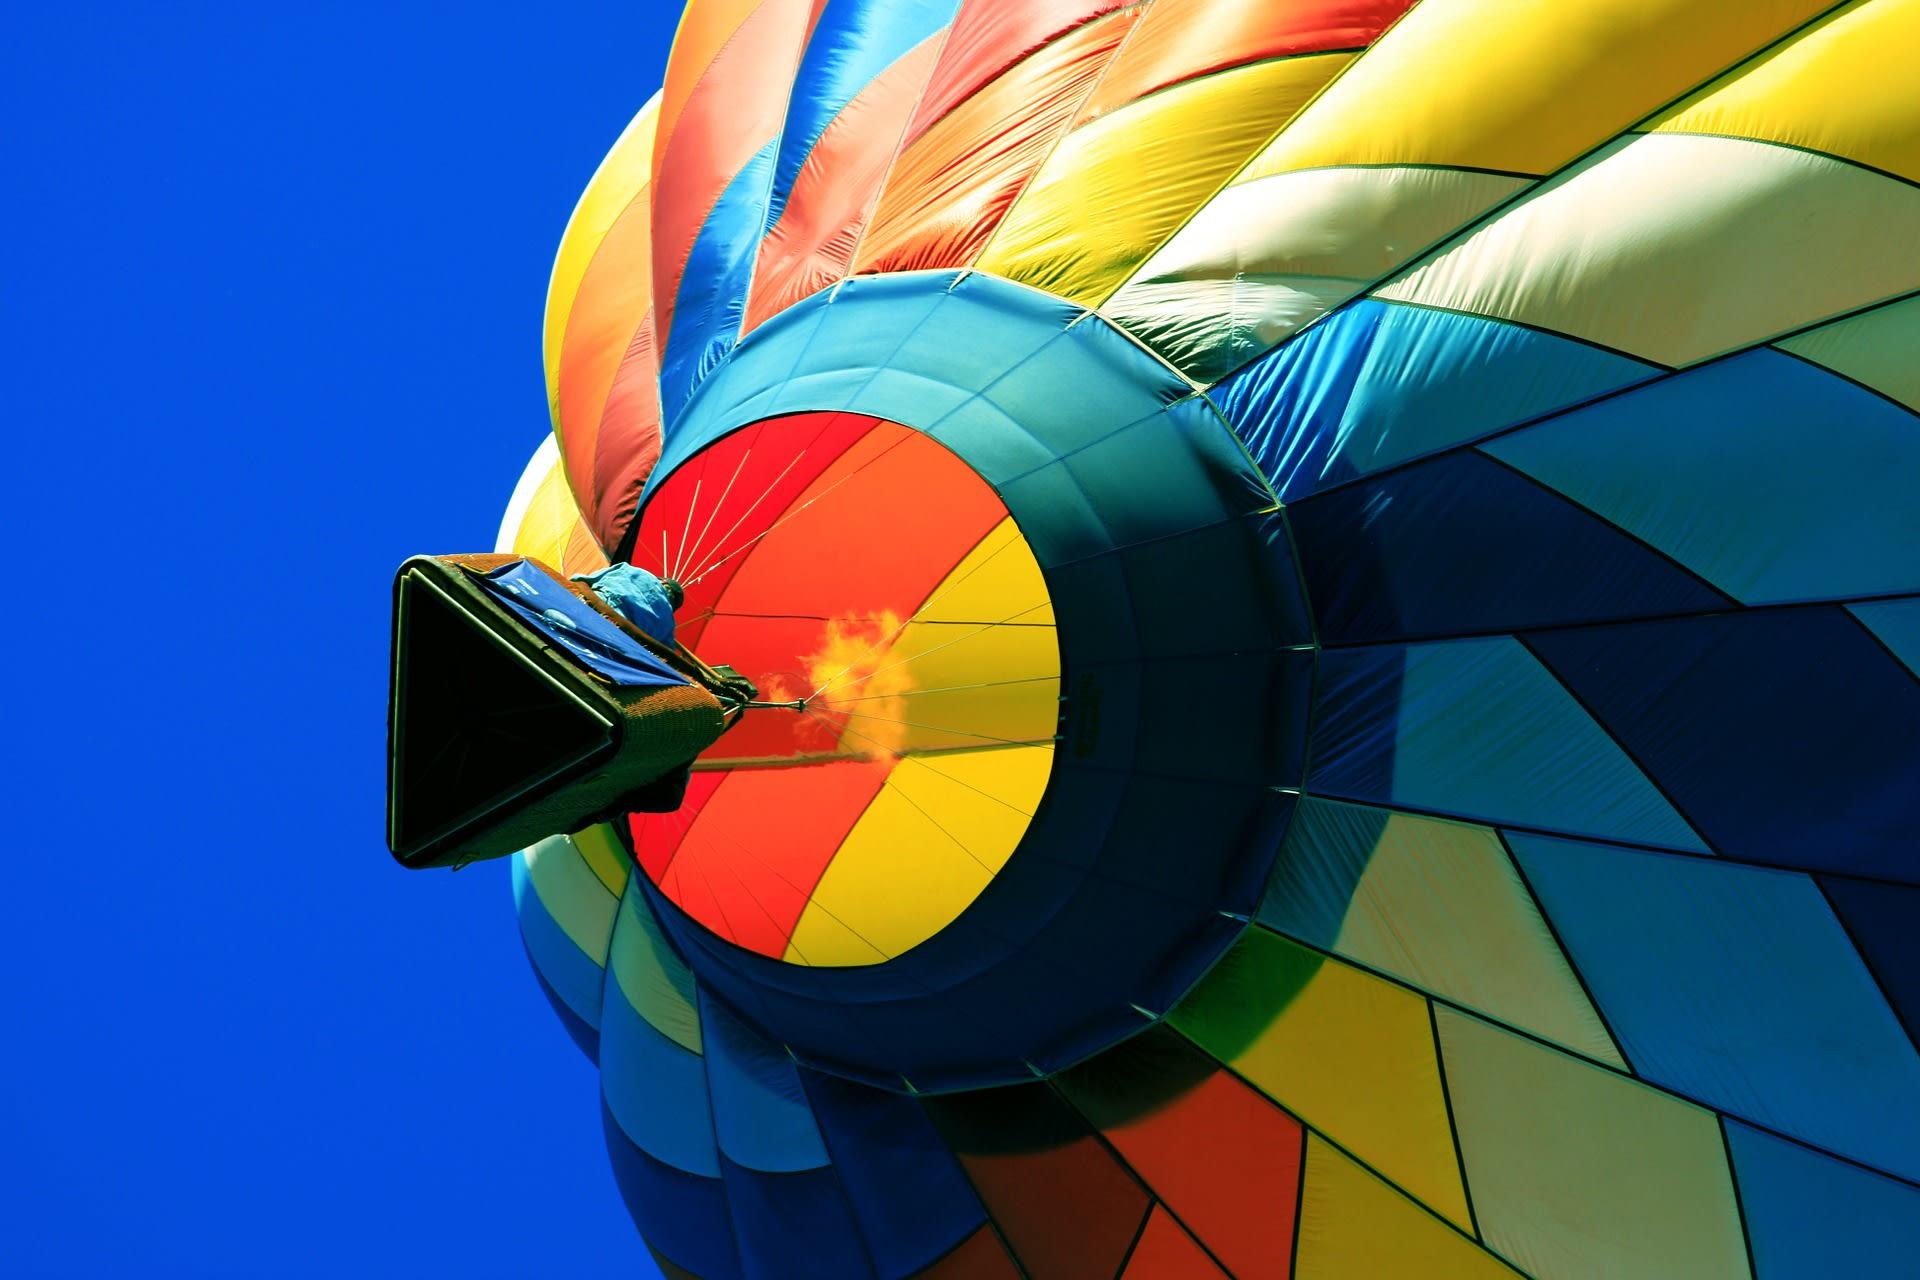 Fliegender Heißluftballon